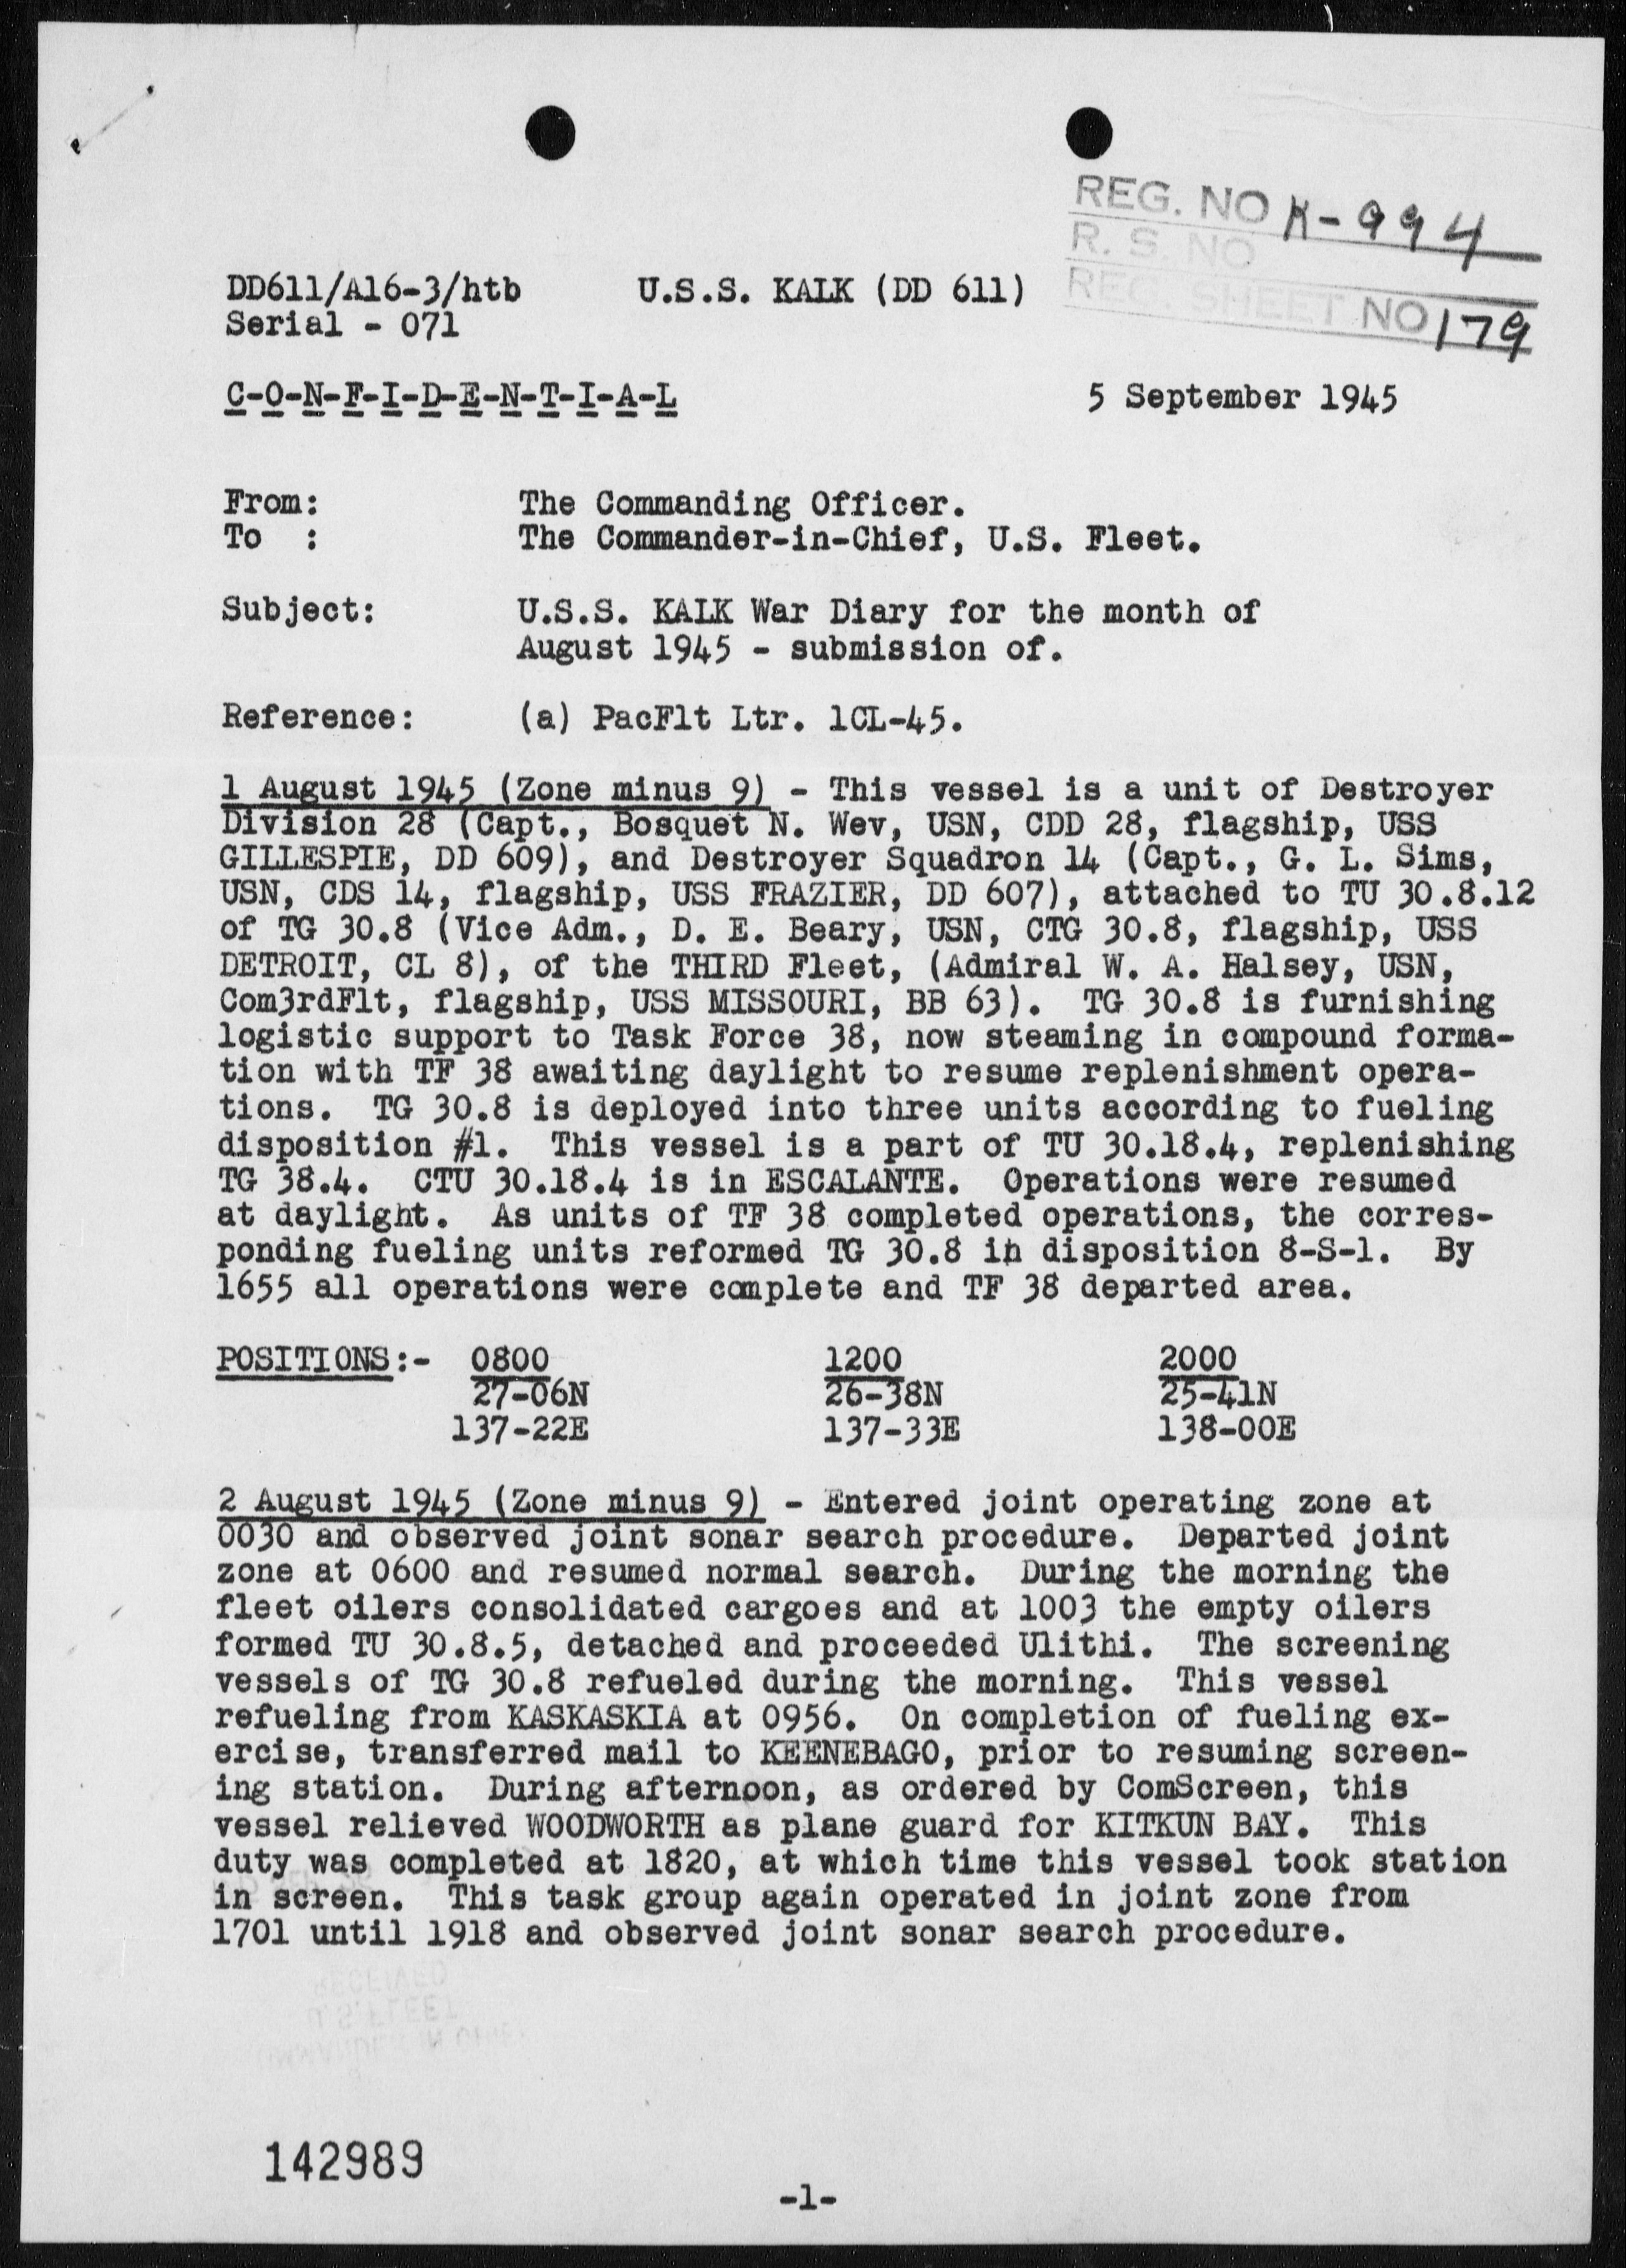 USS KALK - War Diary, 8/1-31/45